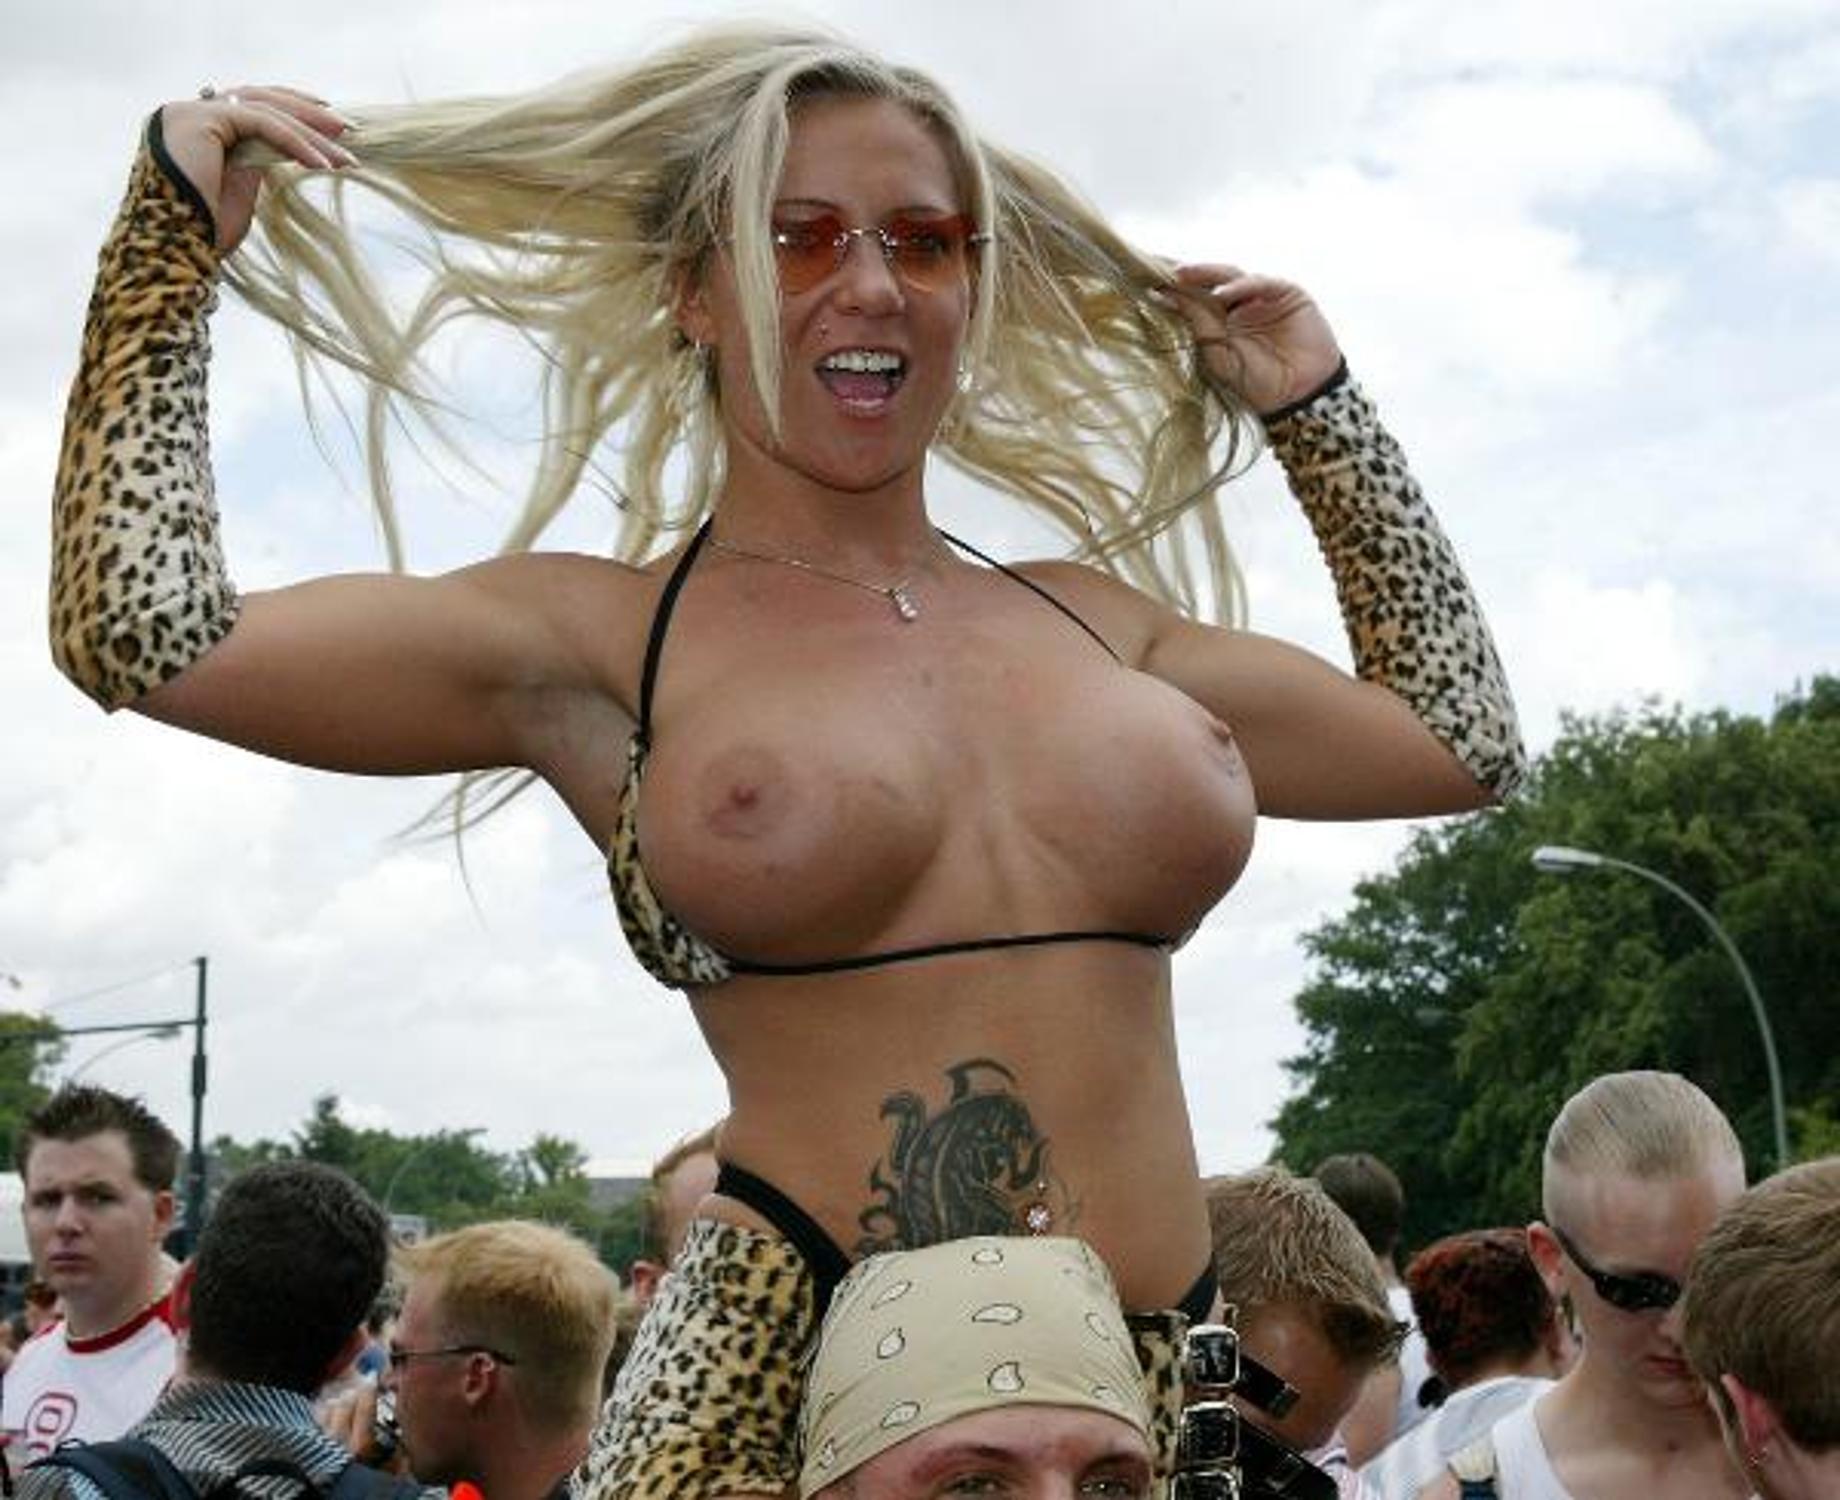 Mastrubates outside love parade berlin free porn images